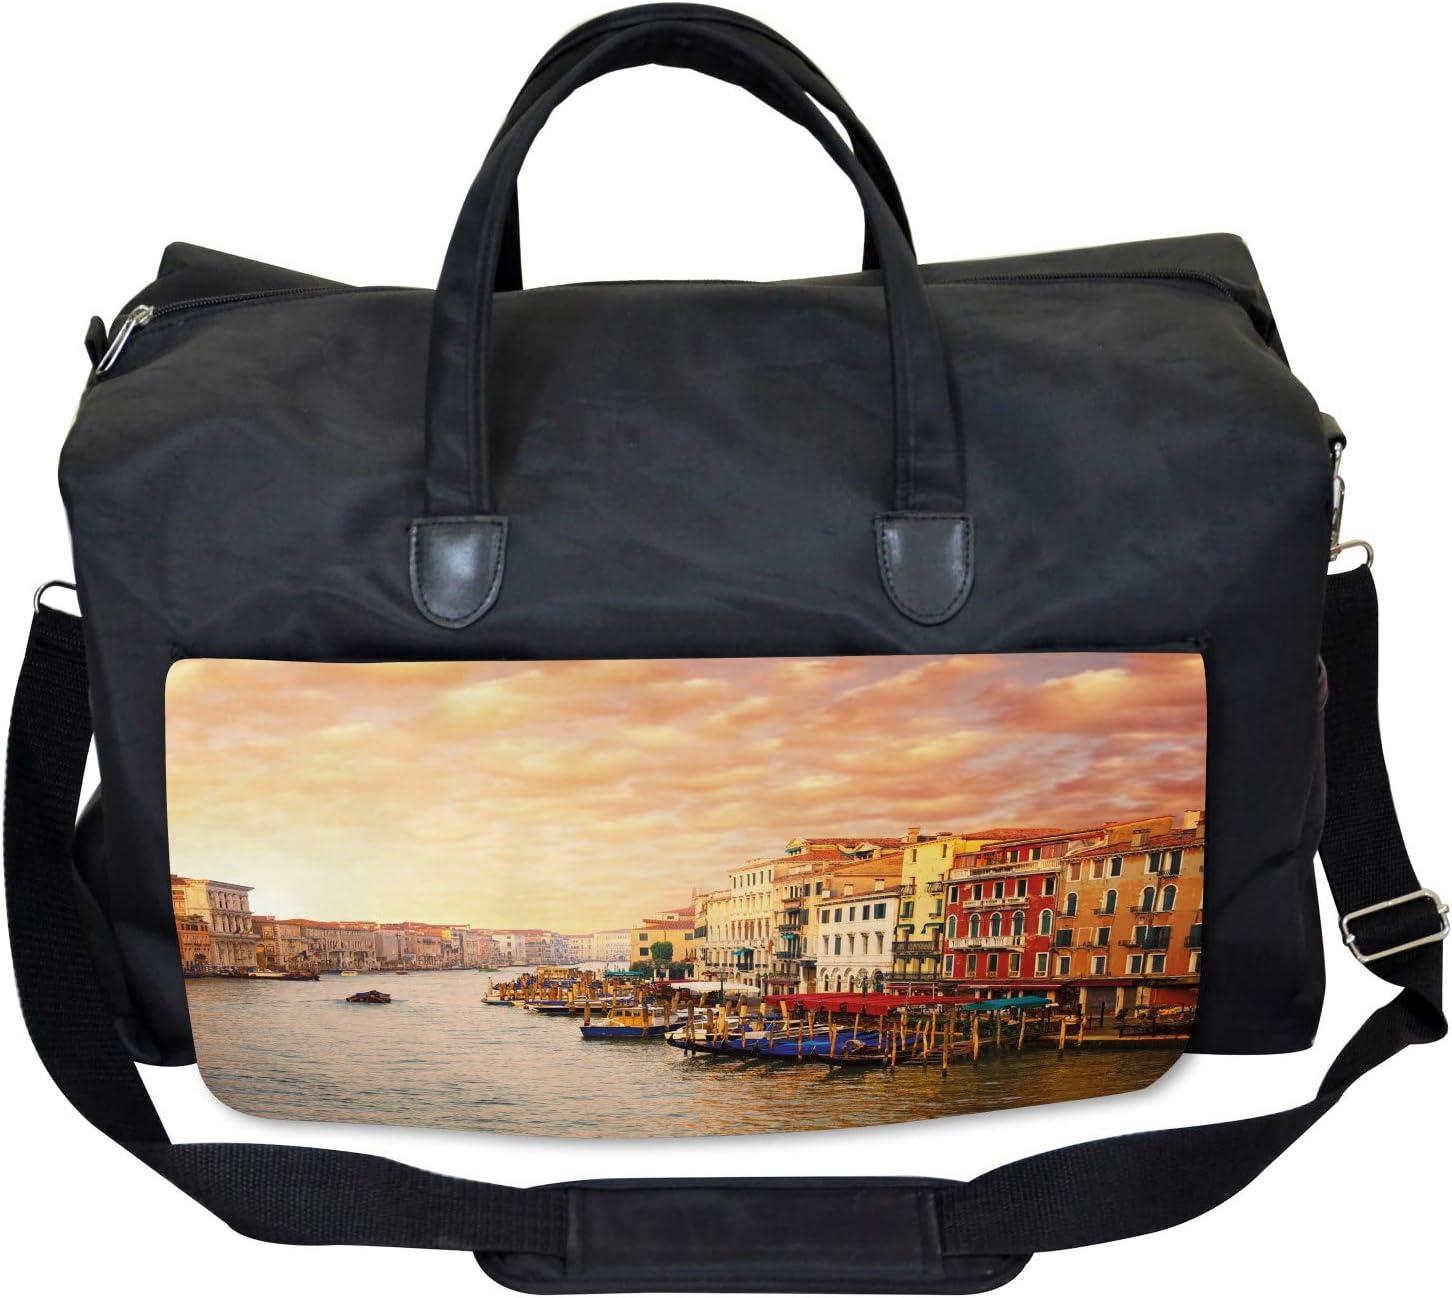 Ambesonne Scenery Gym Bag Large Weekender Carry-on Italian Venezia Image